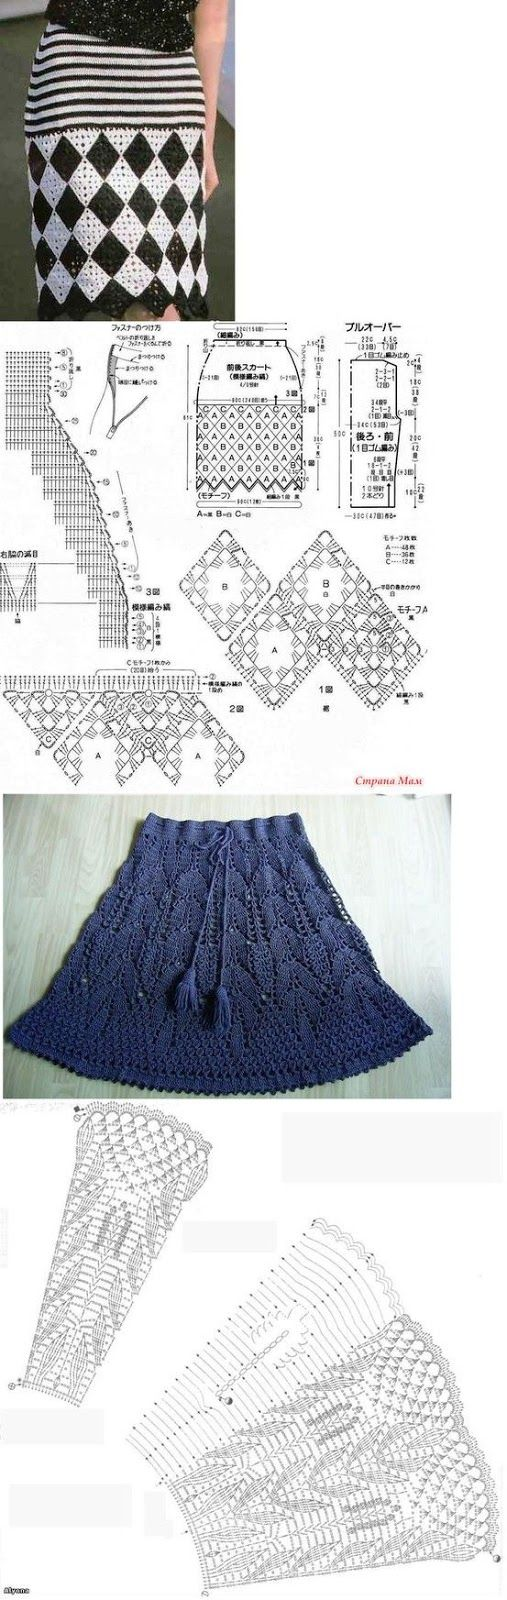 Luty Artes Crochet: Saias em crochê + Gráficos. …